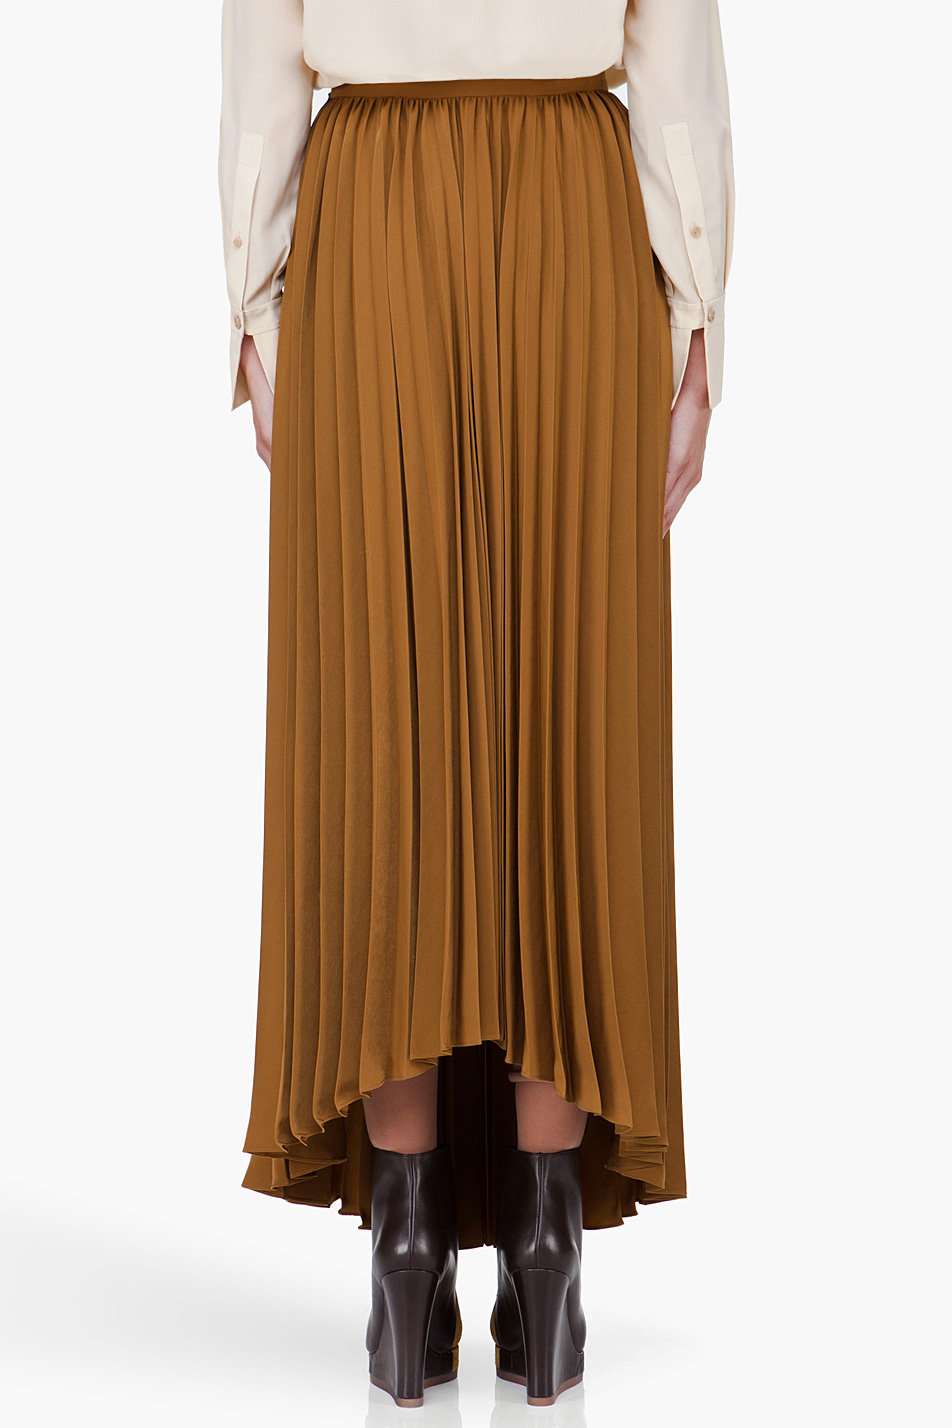 Brown Long Skirt 36